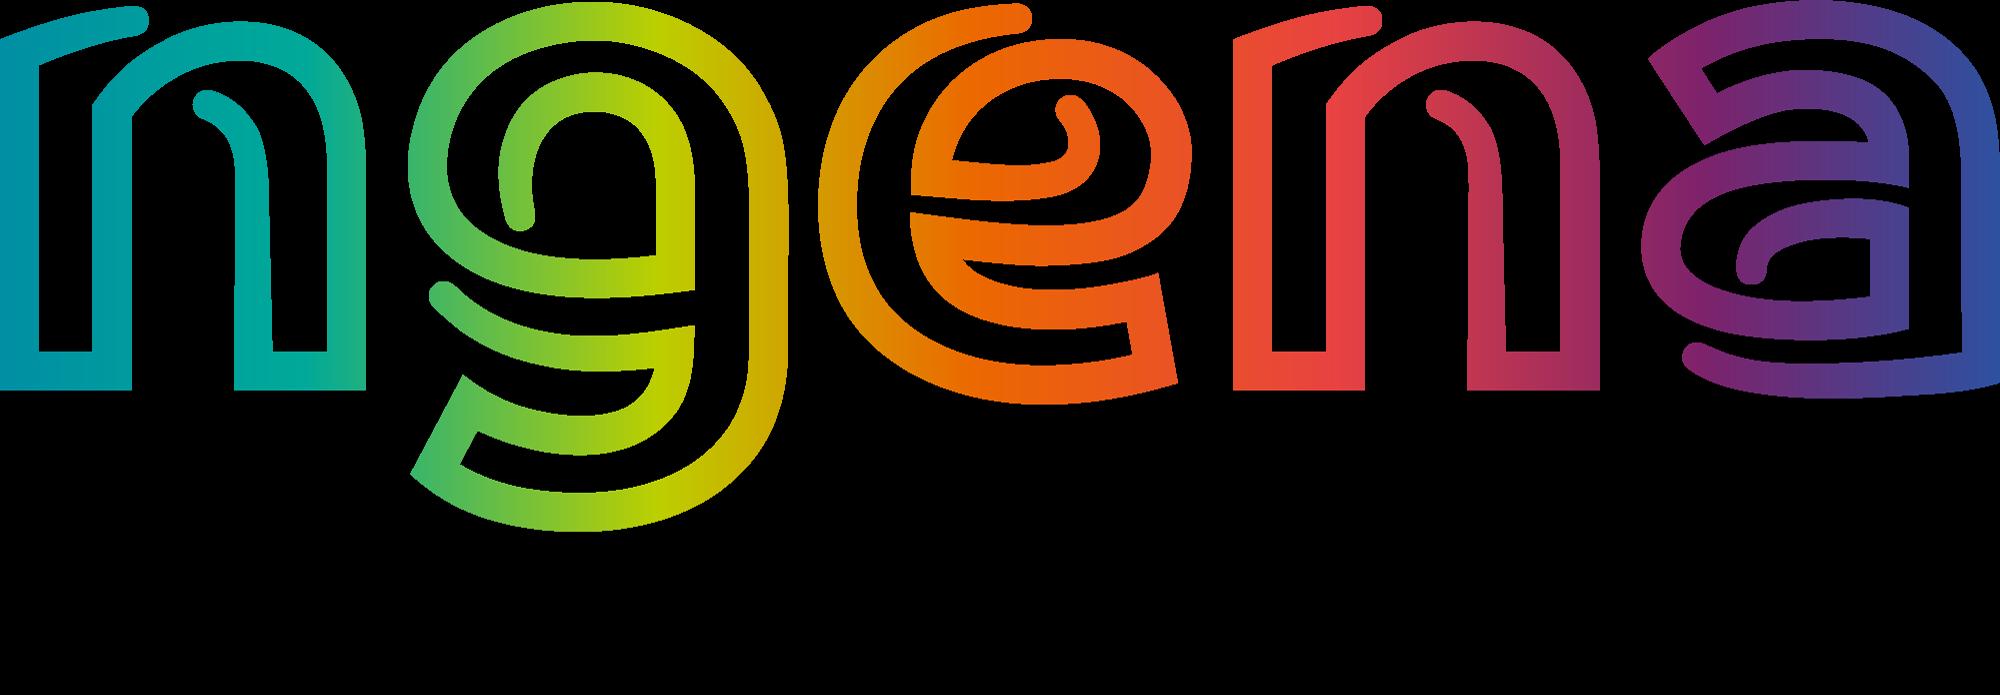 ngena logo